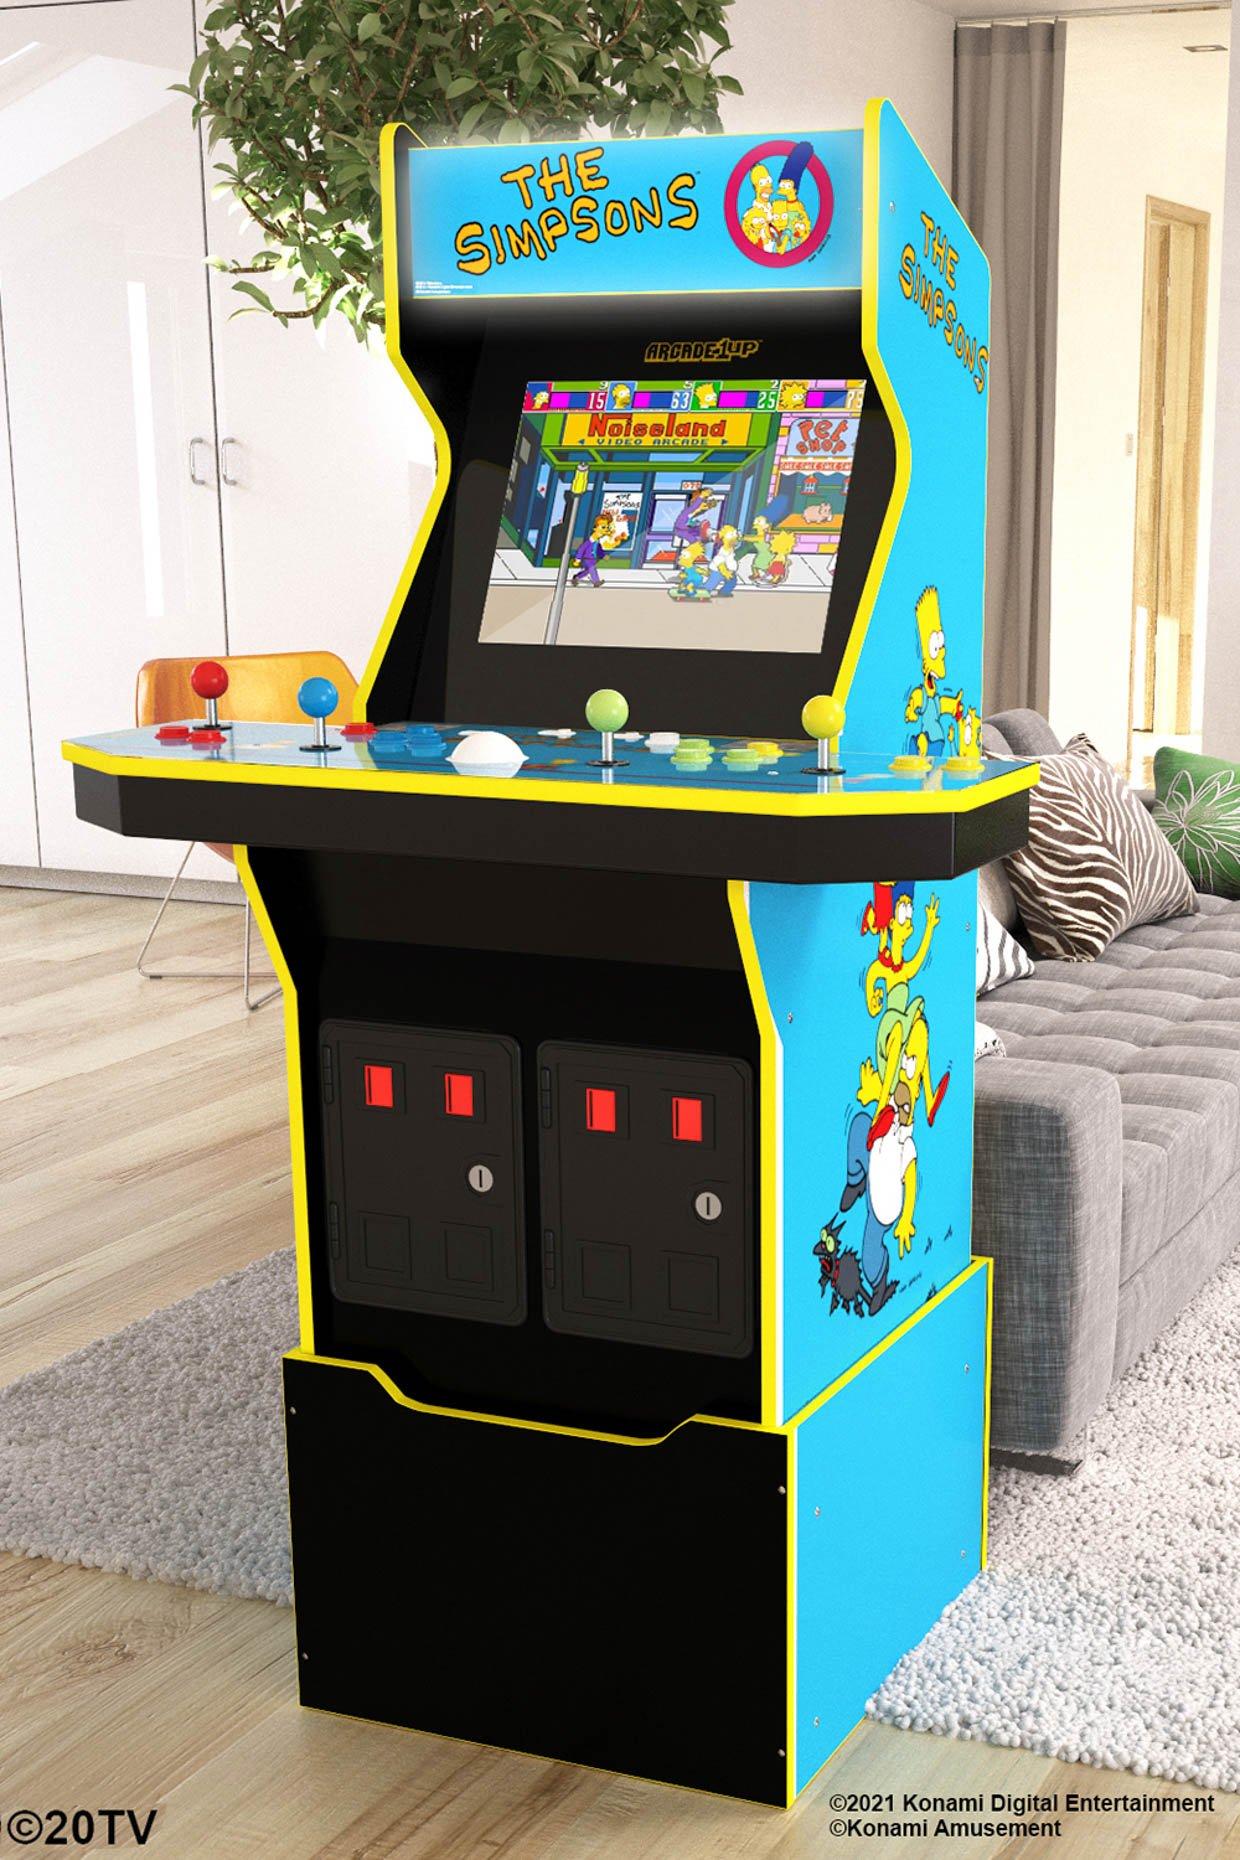 Arcade1Up The Simpsons Arcade Machine